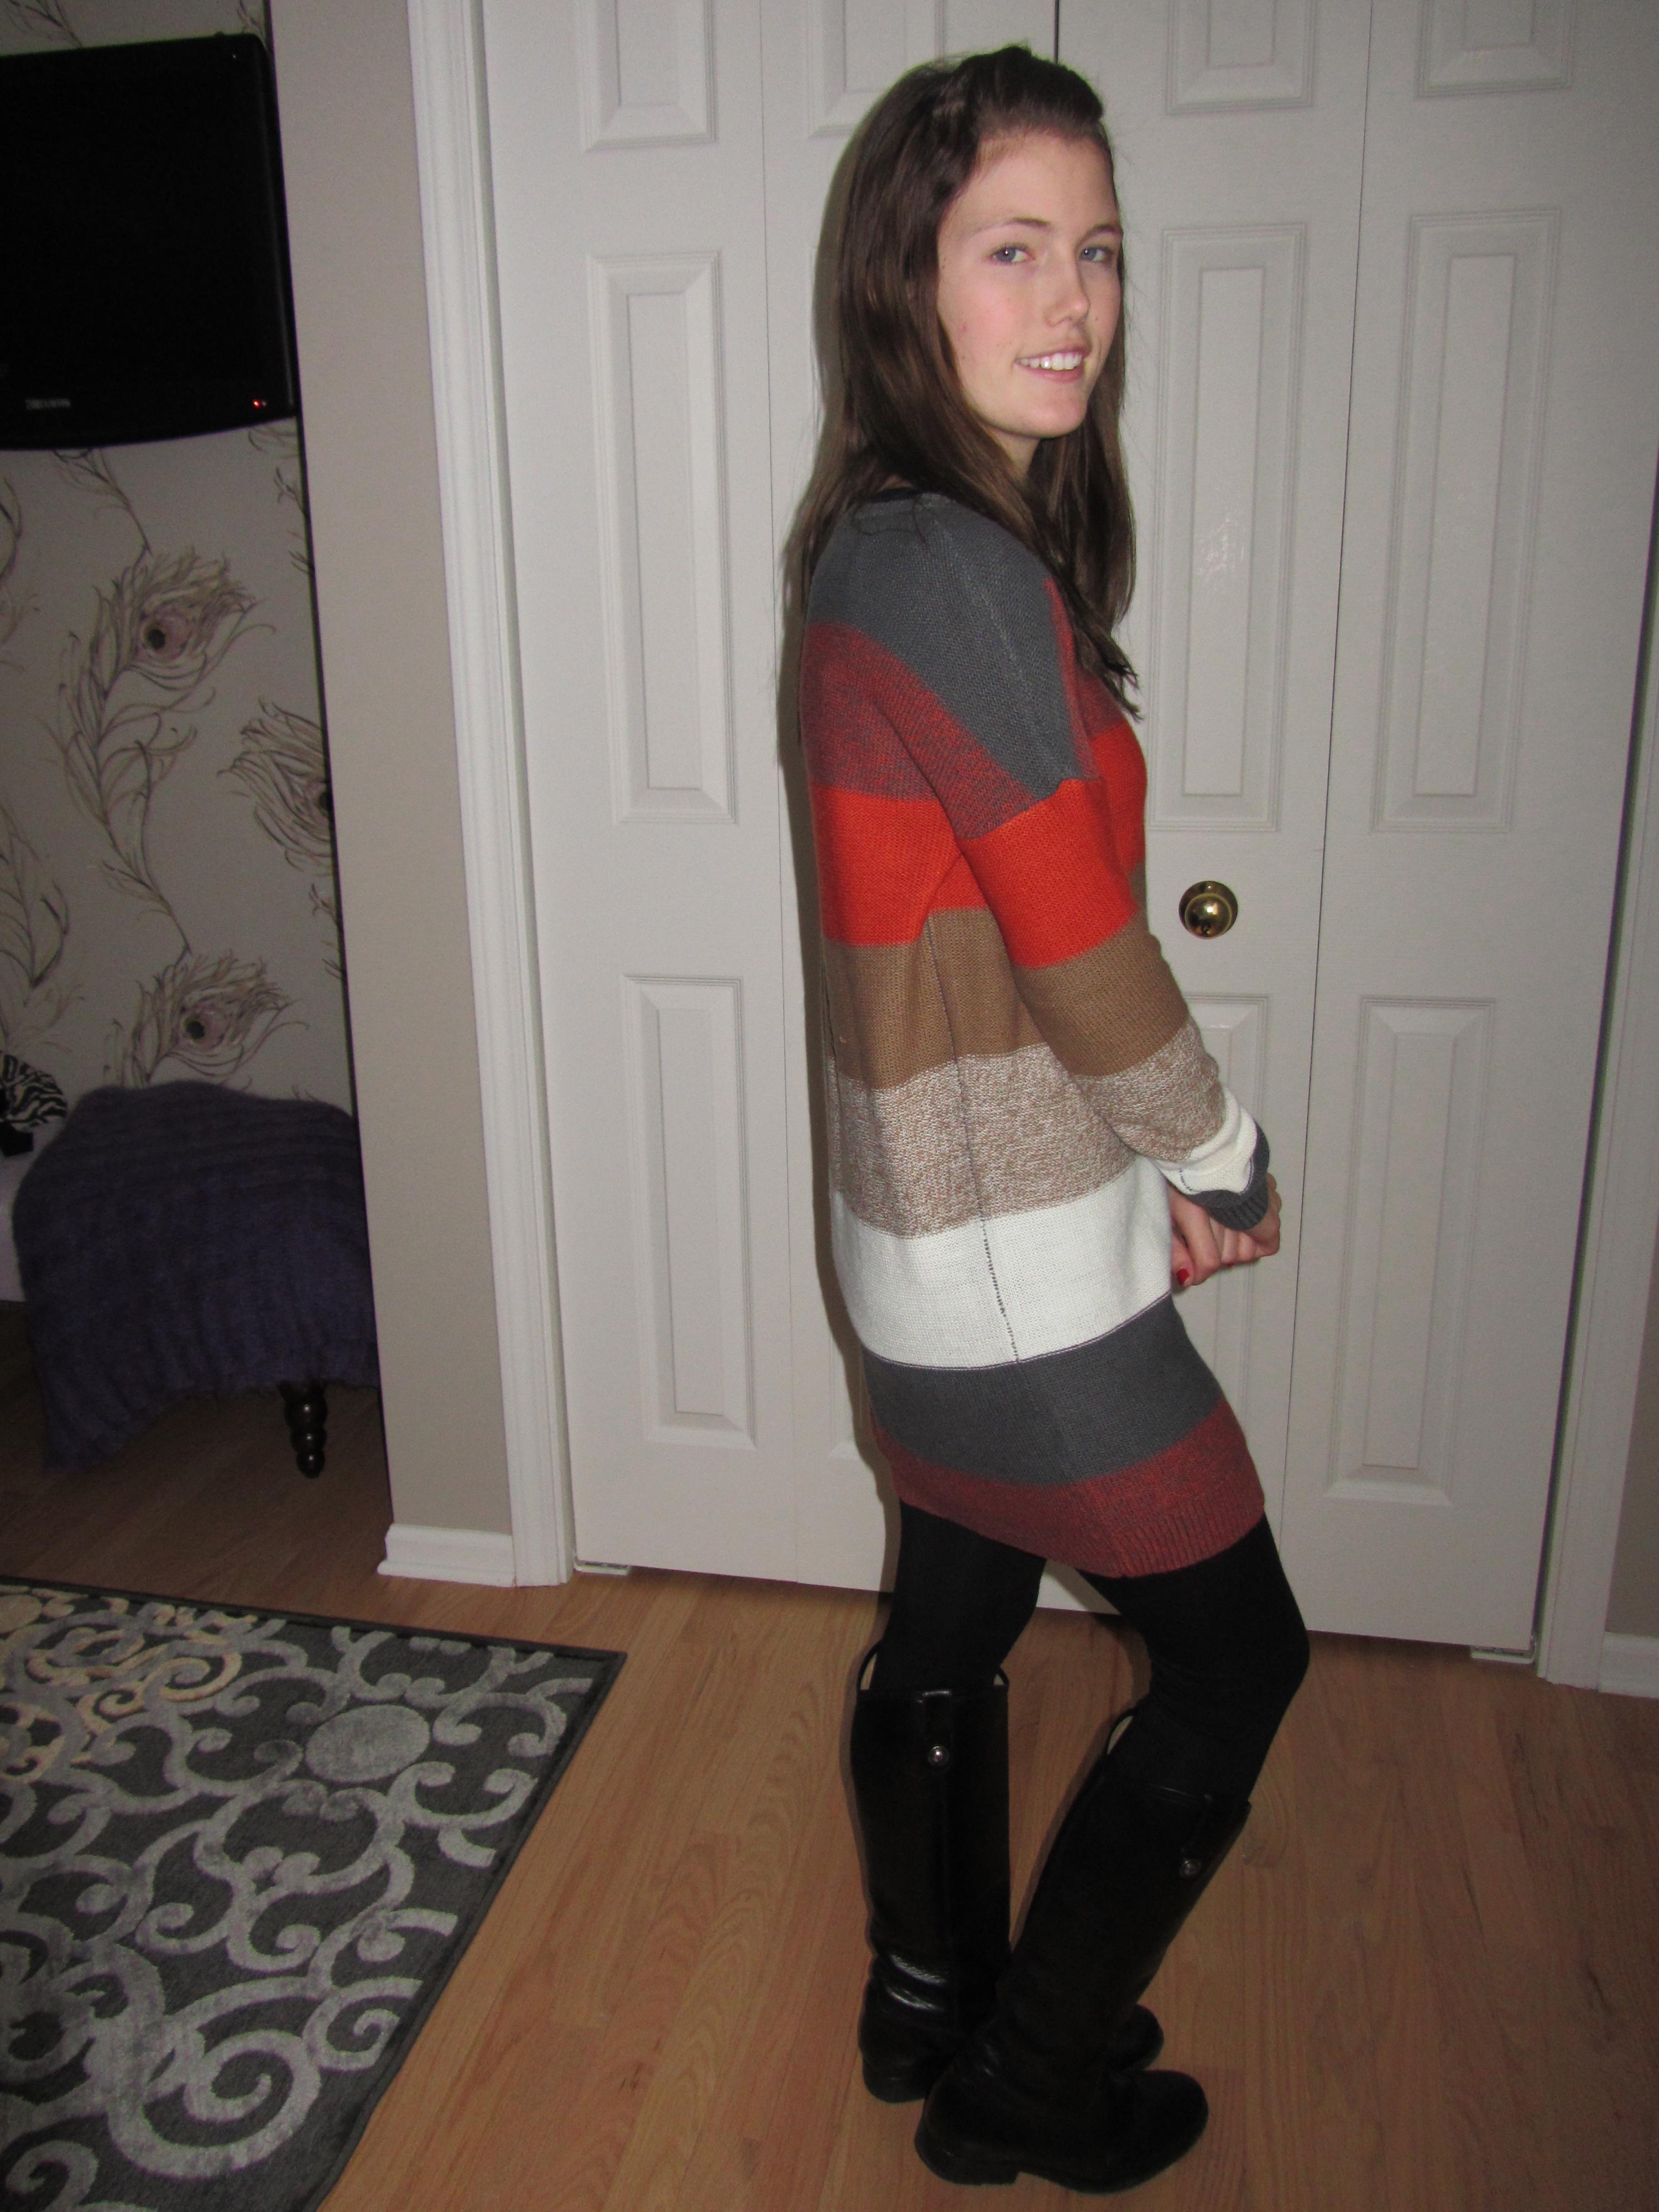 To wear a sweater dress